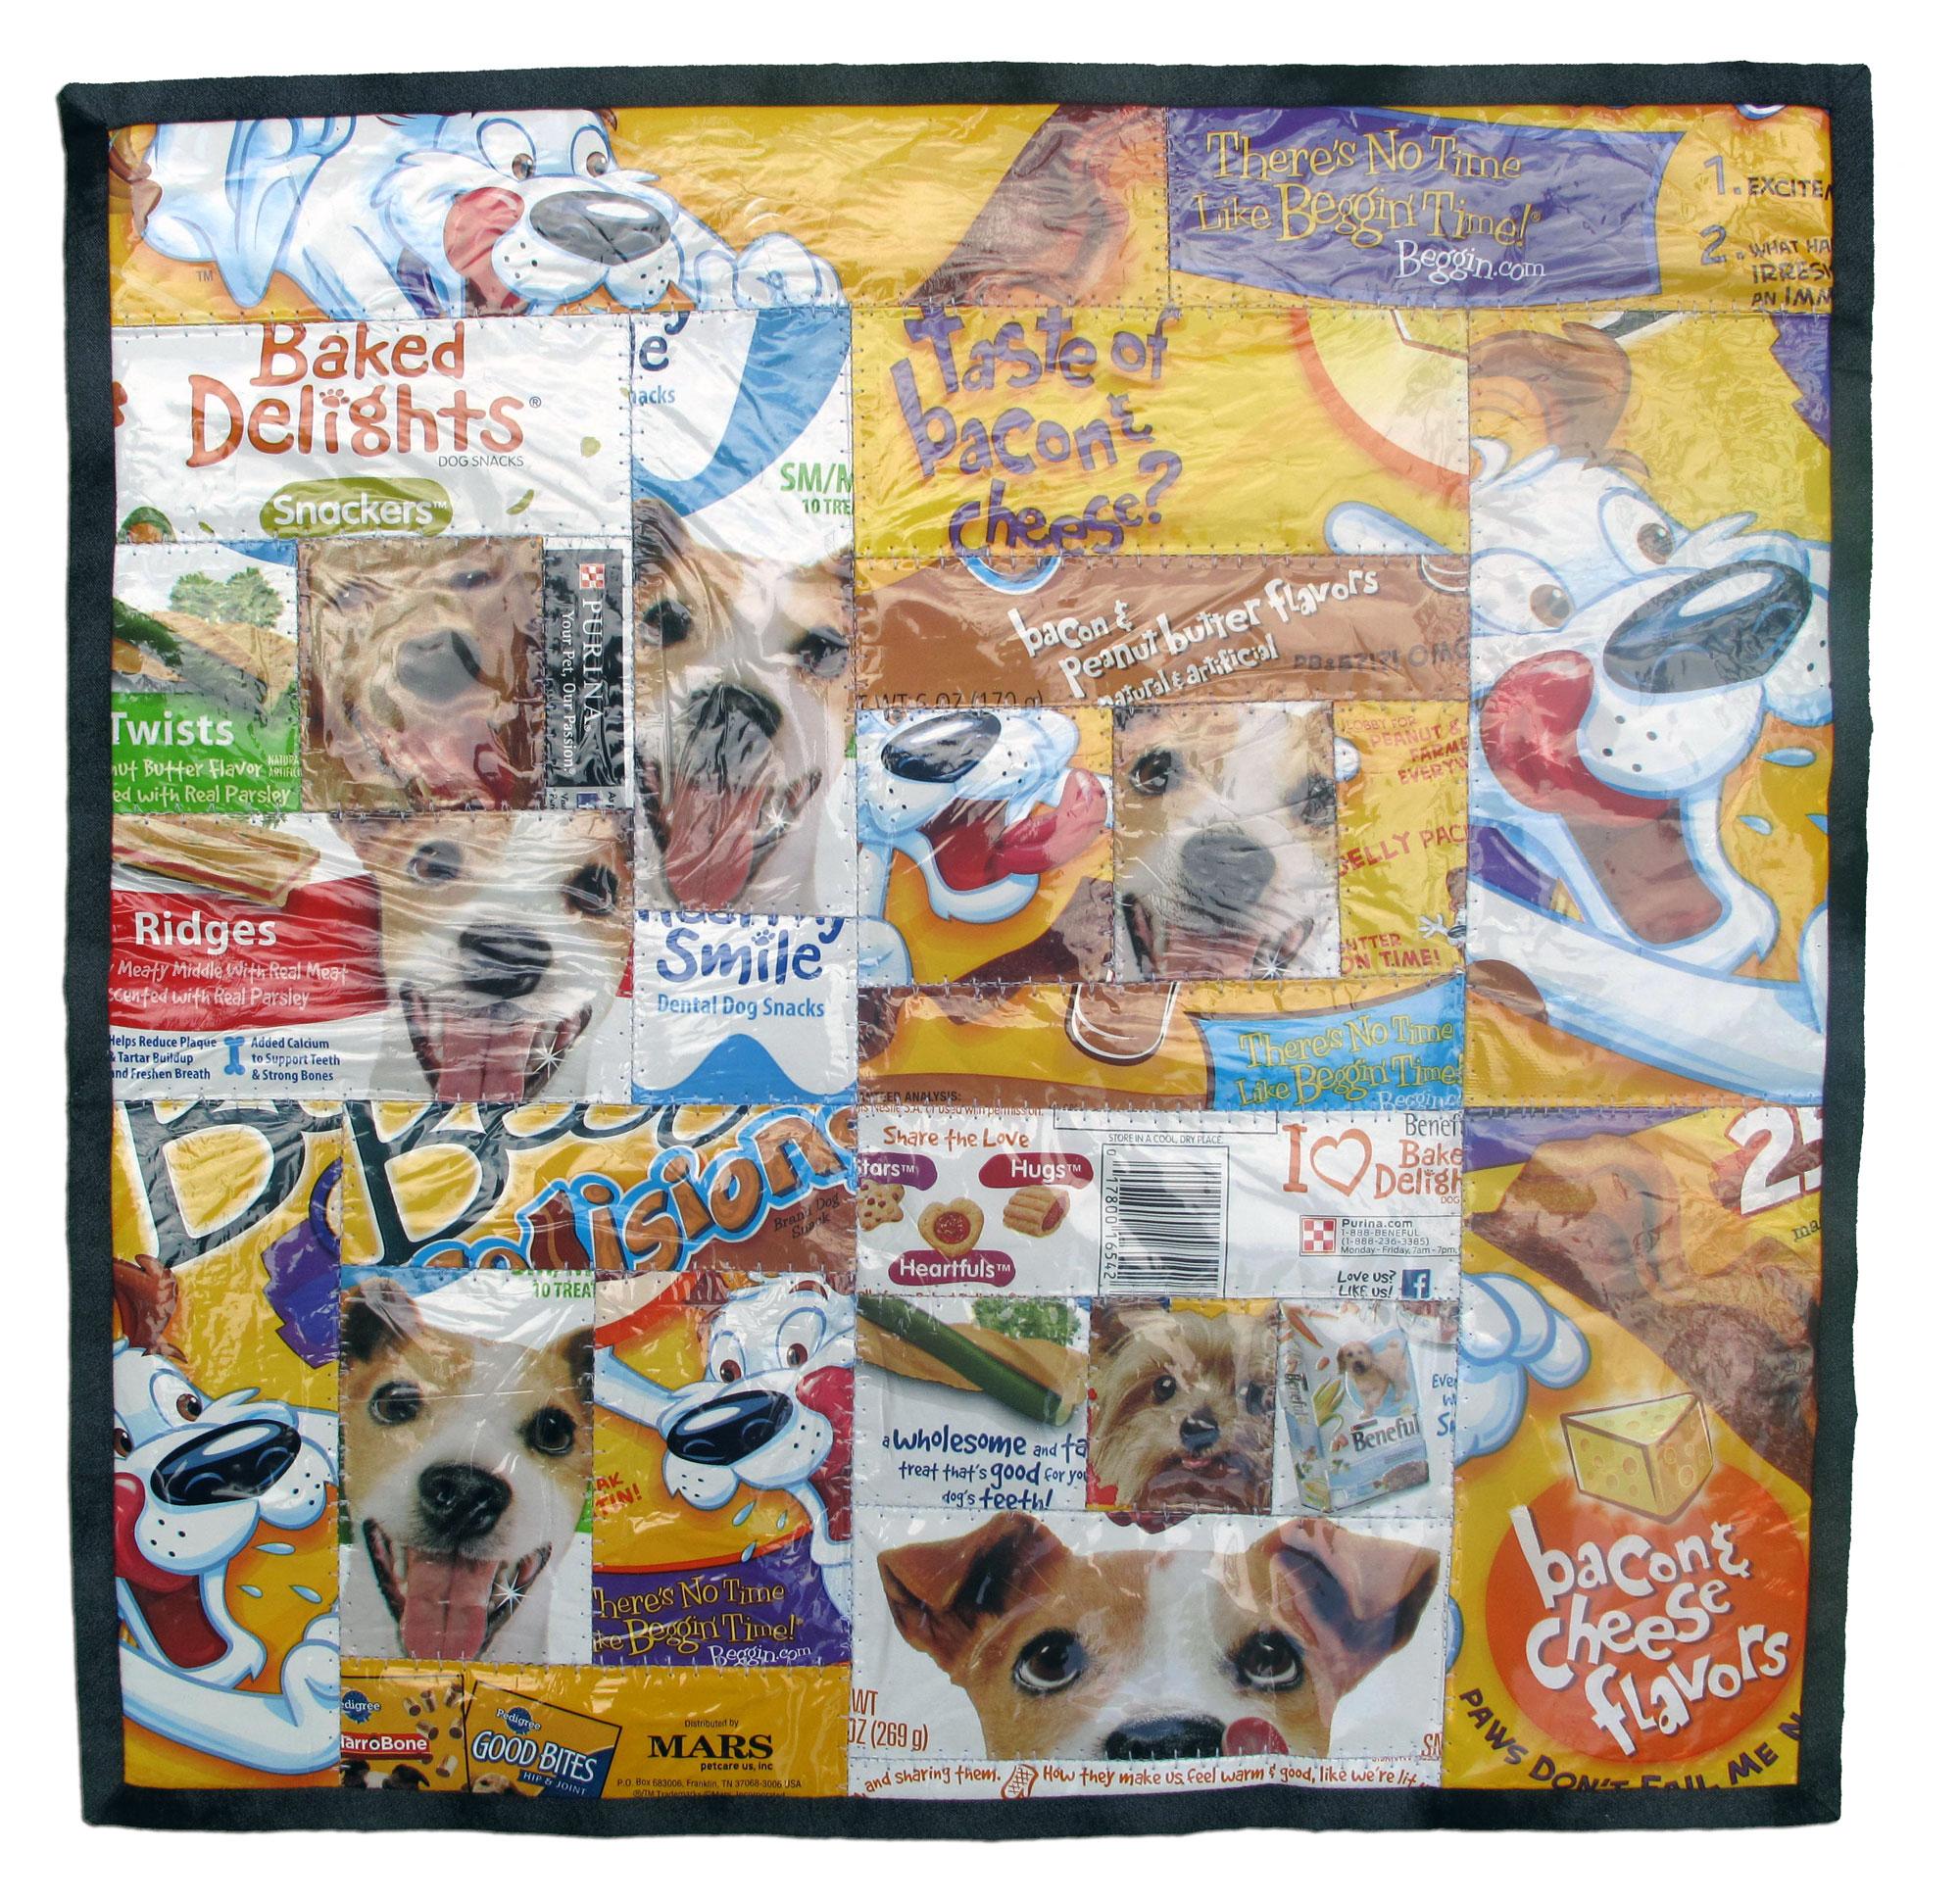 Dog Treats, Ramona Bates, Little Rock, Arkansas